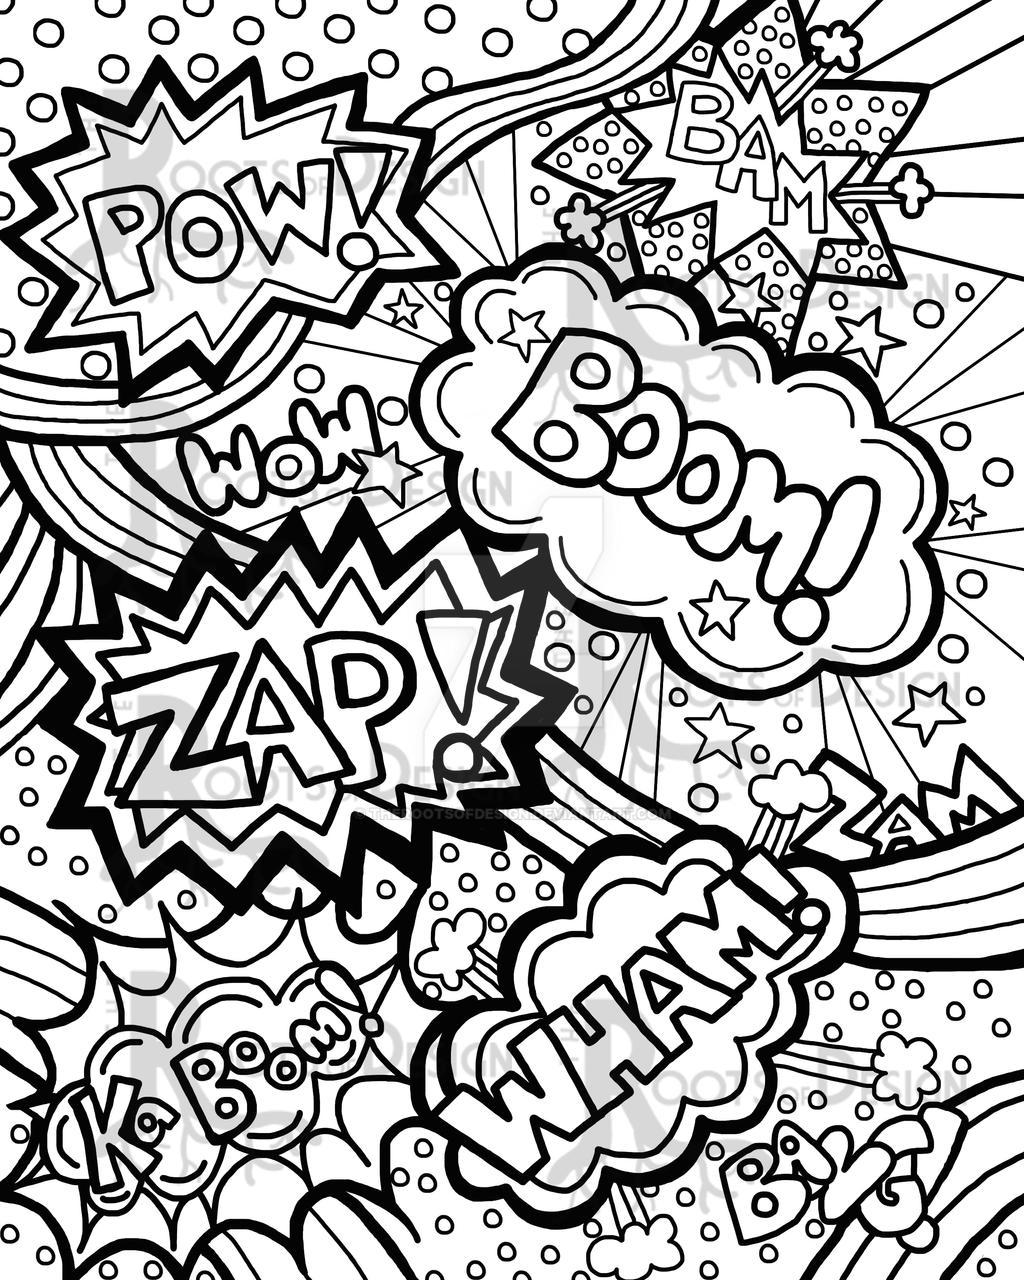 ComicWordsROD by TheRootsOfDesign on DeviantArt